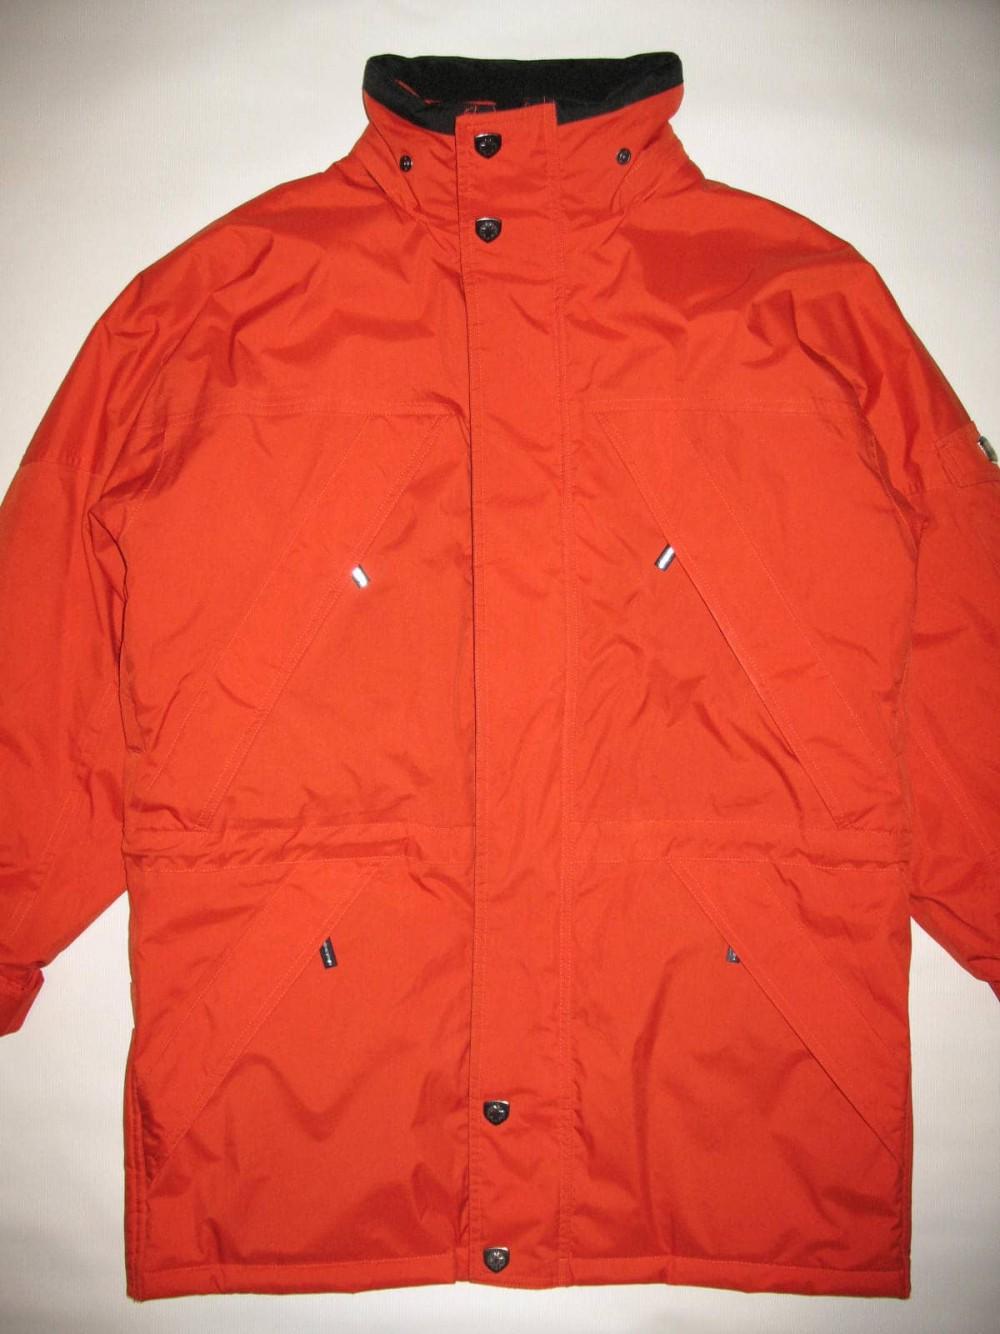 Куртка WELLENSTEYN brandungsparka jacket (размер S/M) - 2